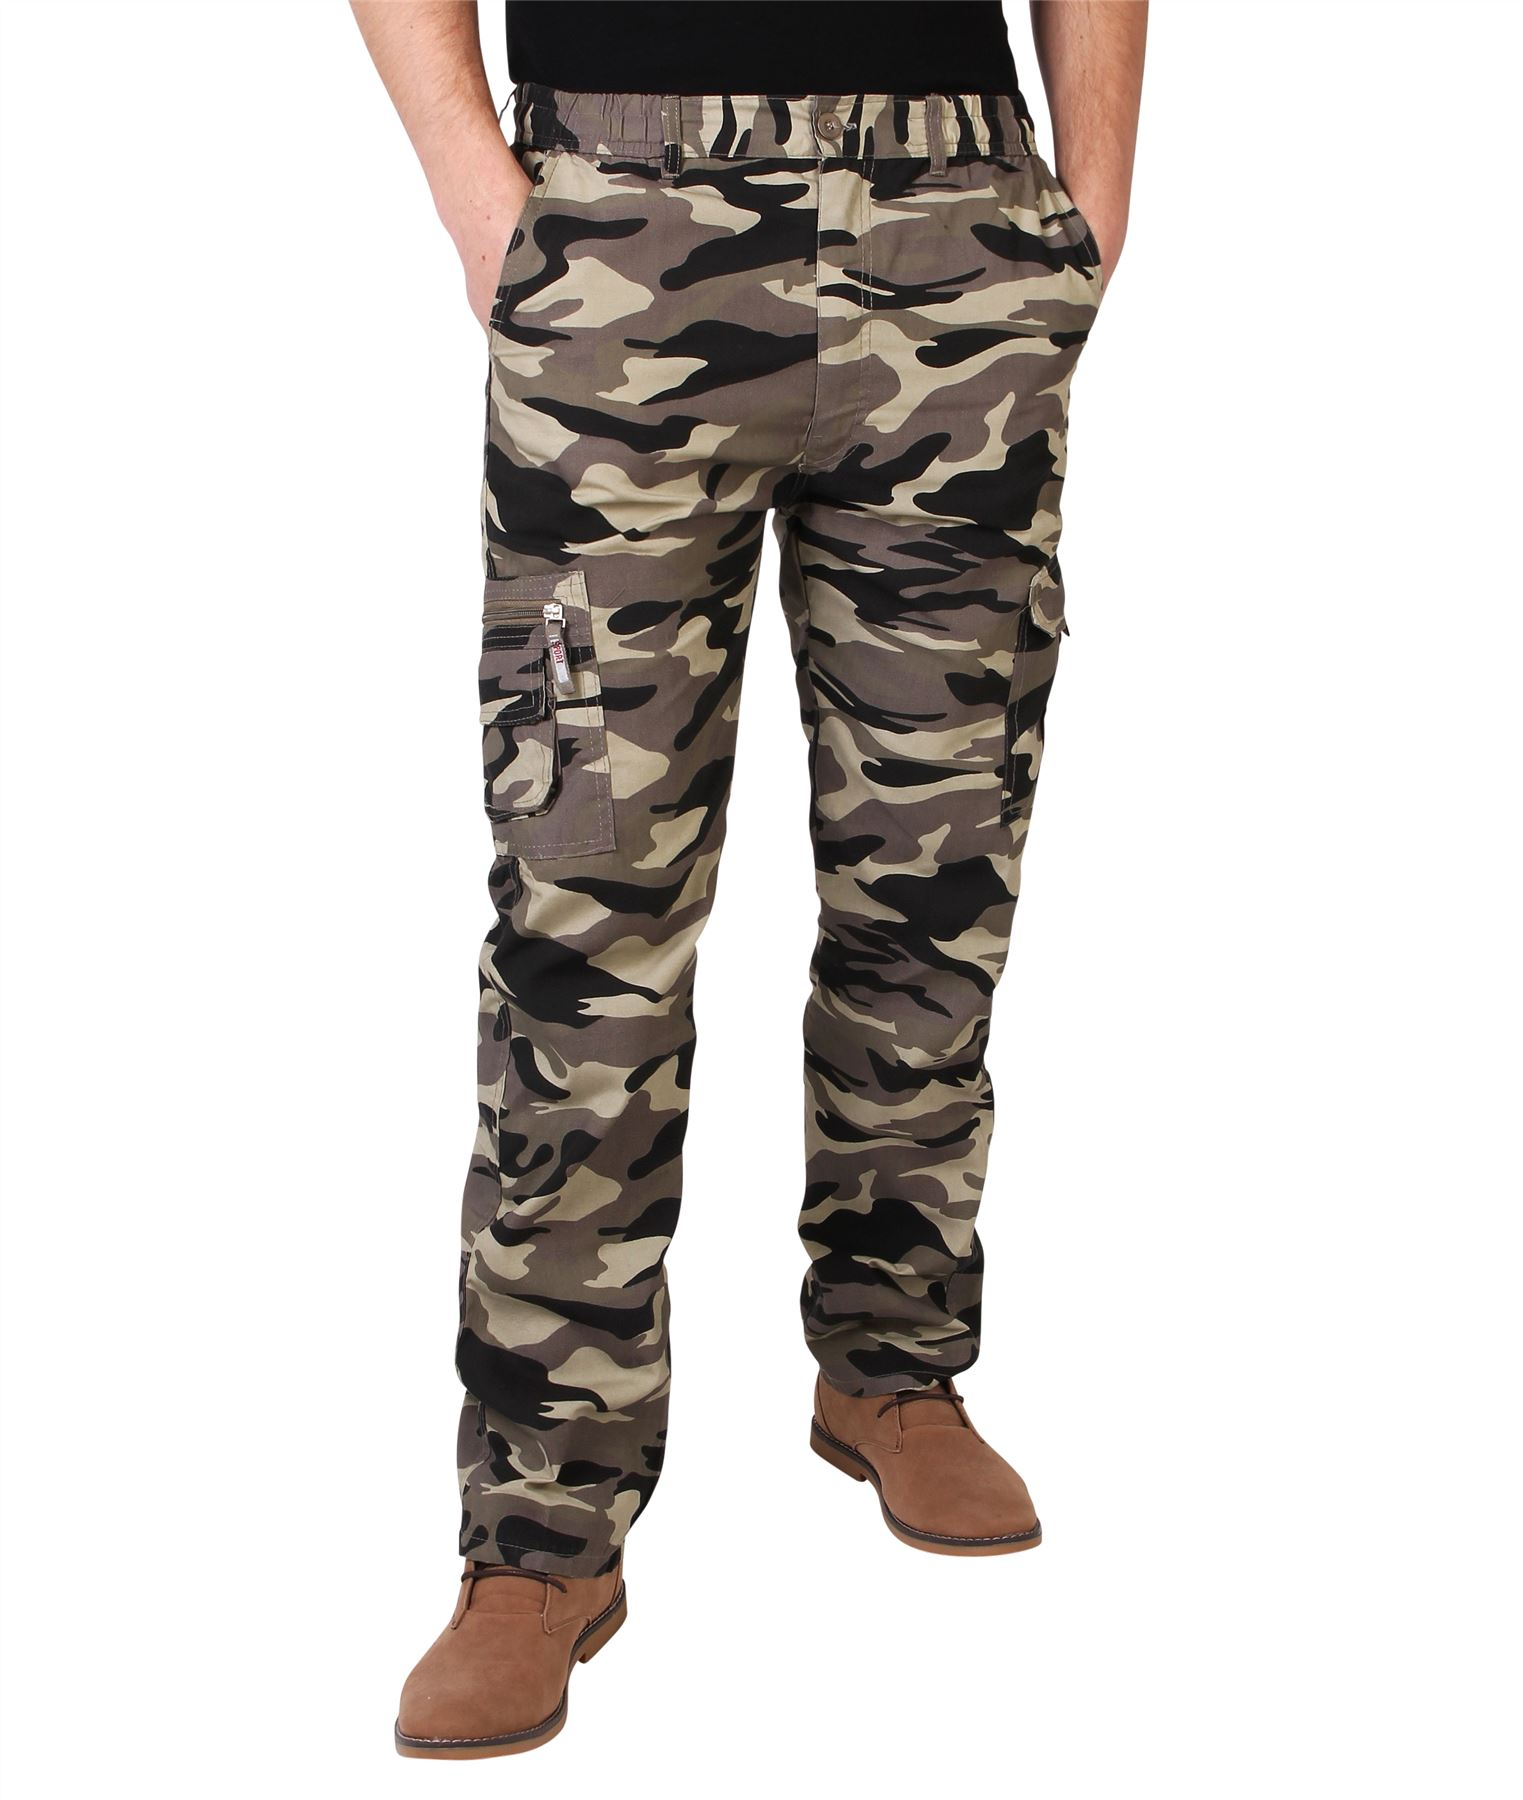 aef90ca478ae8 Homme Pantalon Imprimé Camouflage Cargo Multi Poches Style Militaire ...